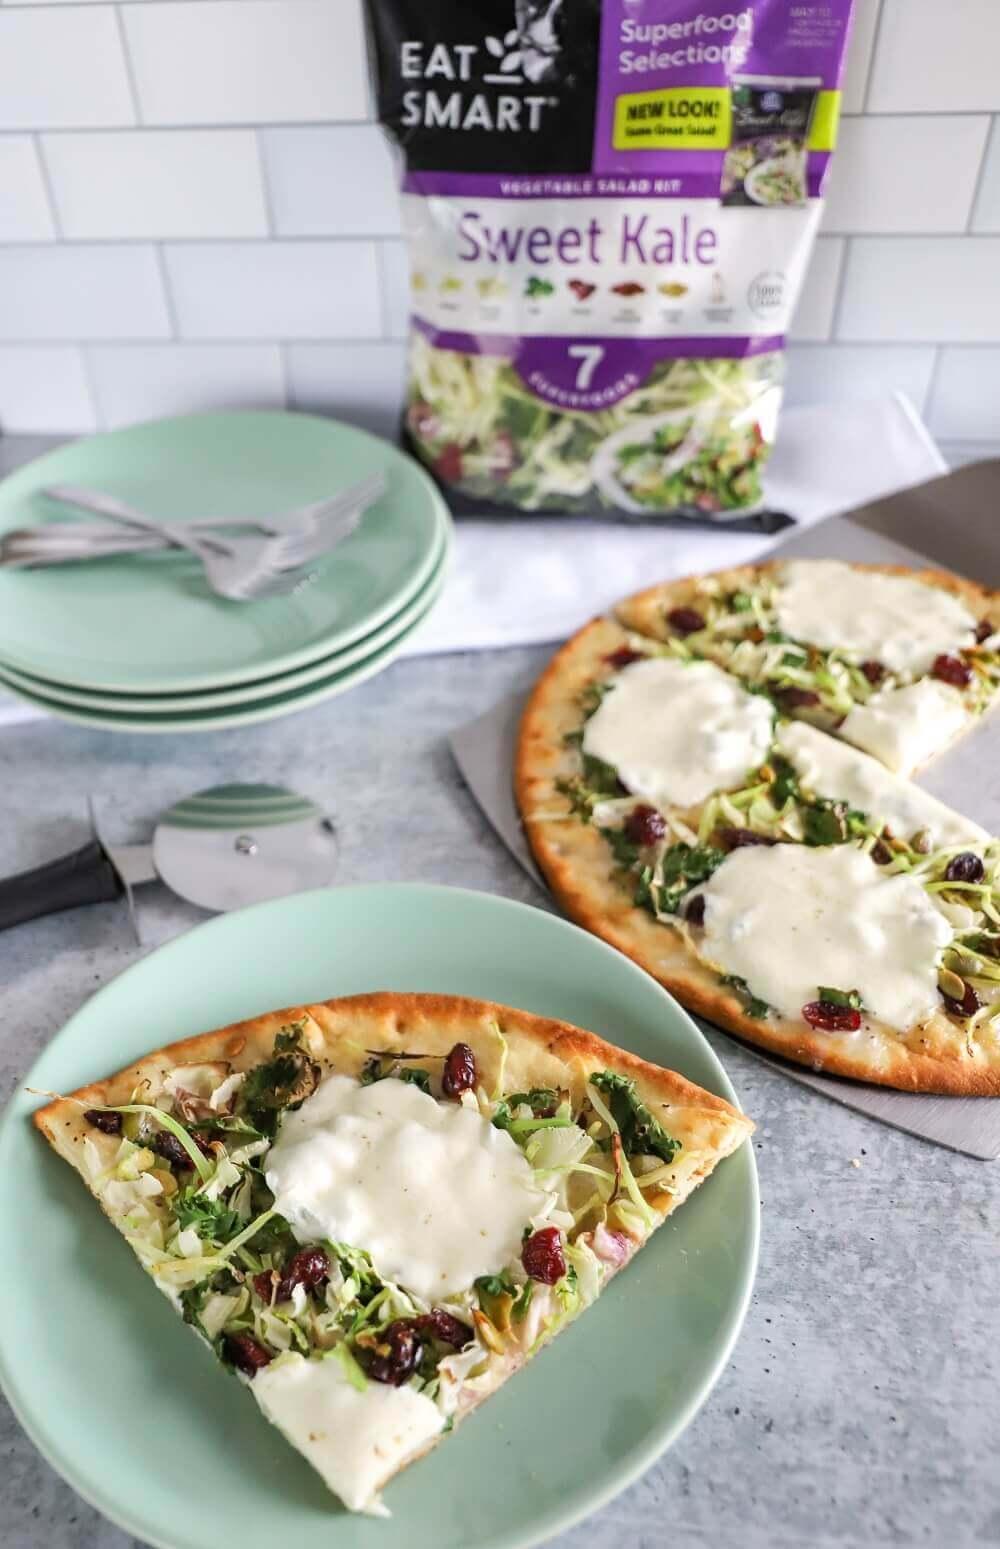 Sweet Kale Flatbread Pizza